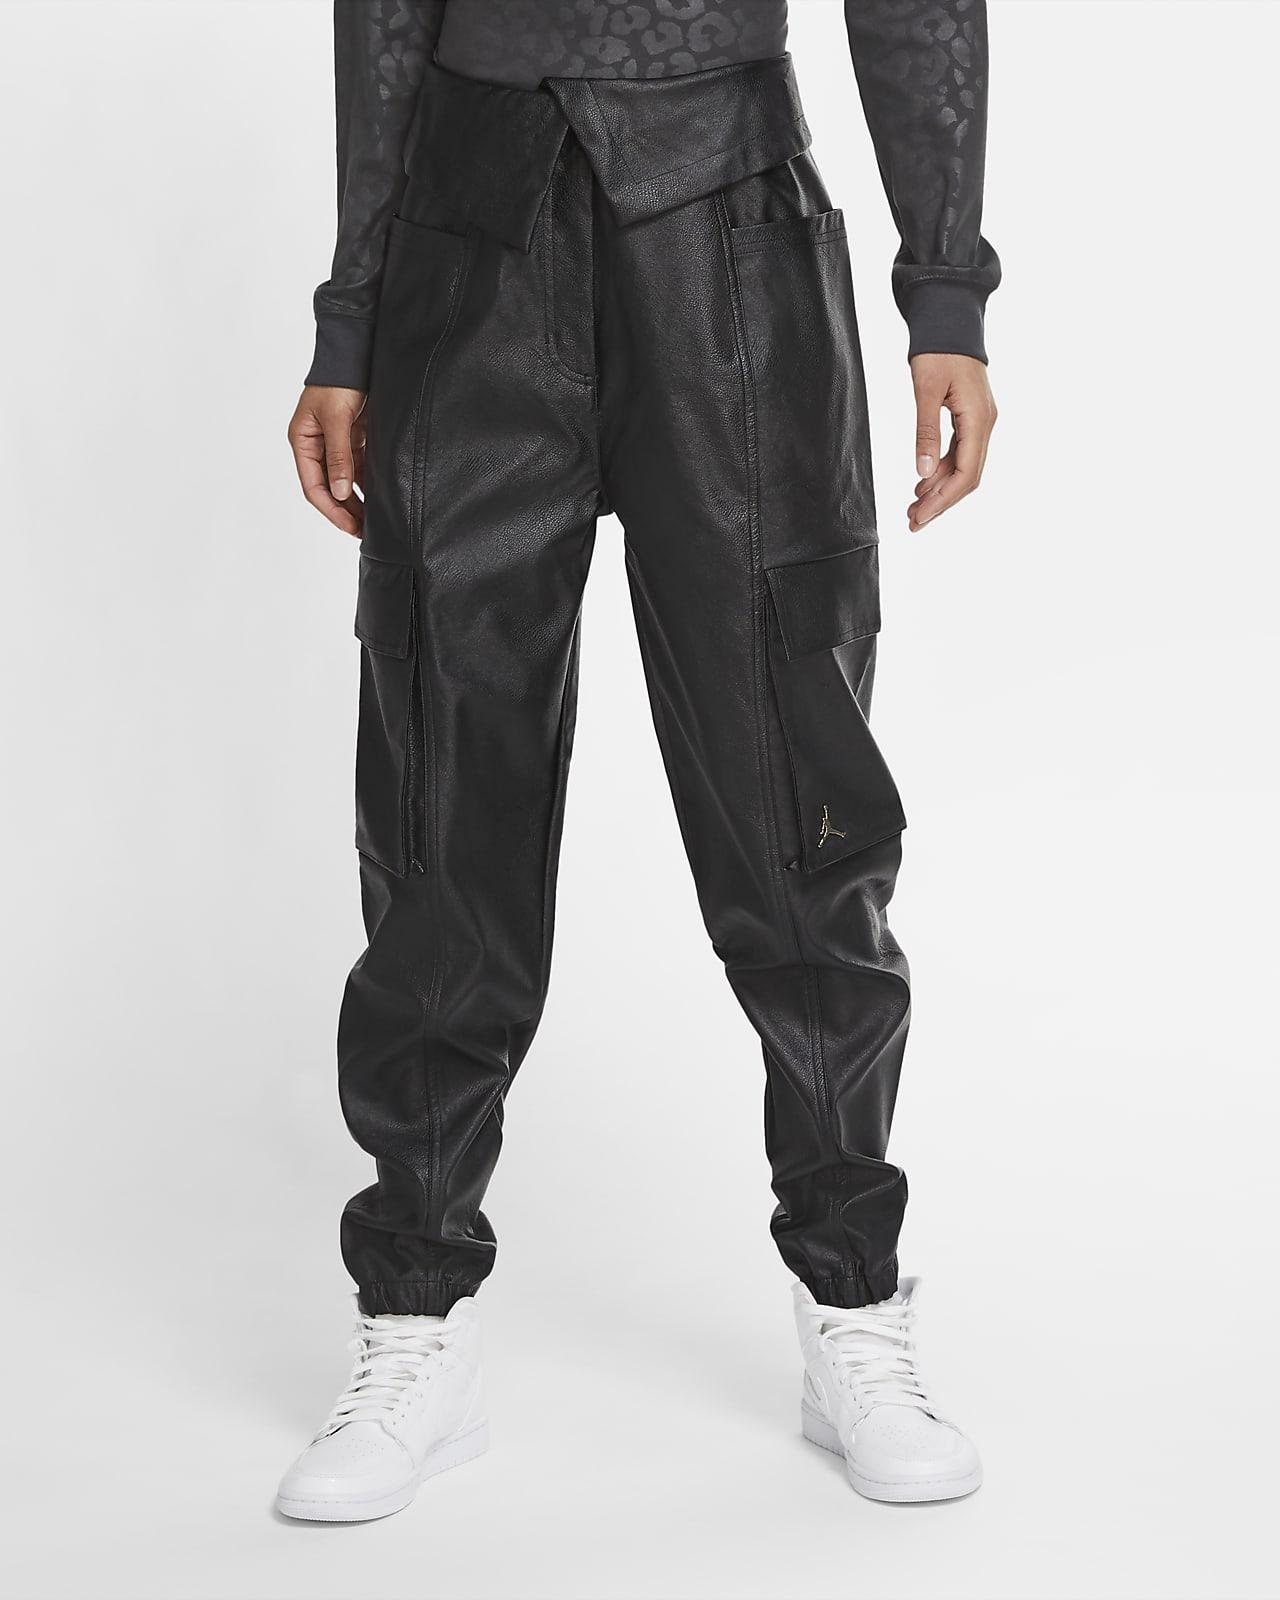 Jordan Court-To-Runway Women's Faux Leather Utility Trousers